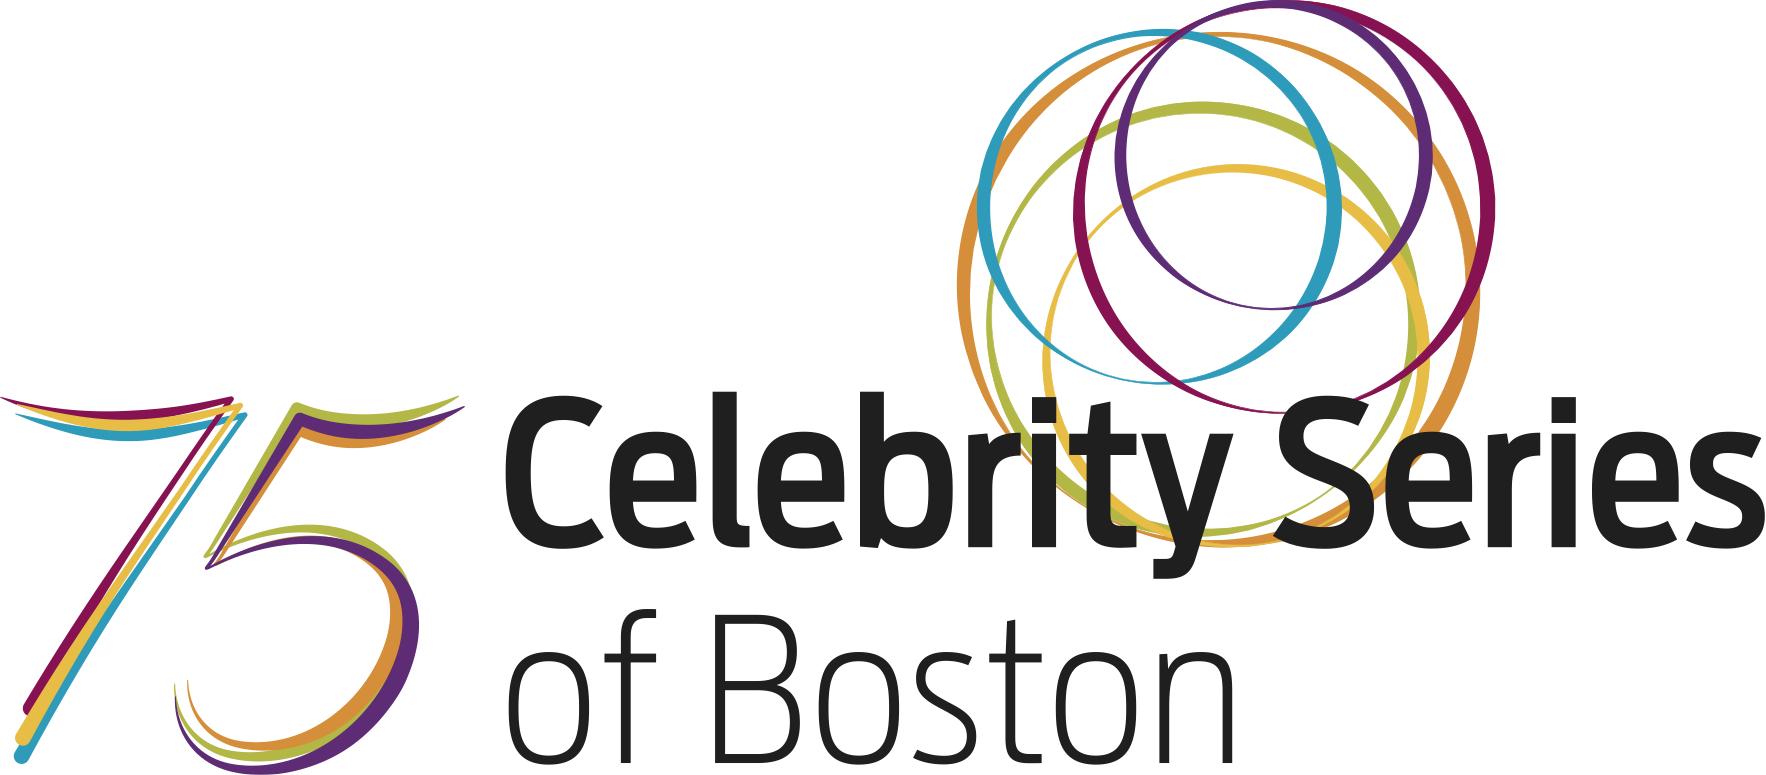 CelebritySeries_identifier_75th_color_large.jpg